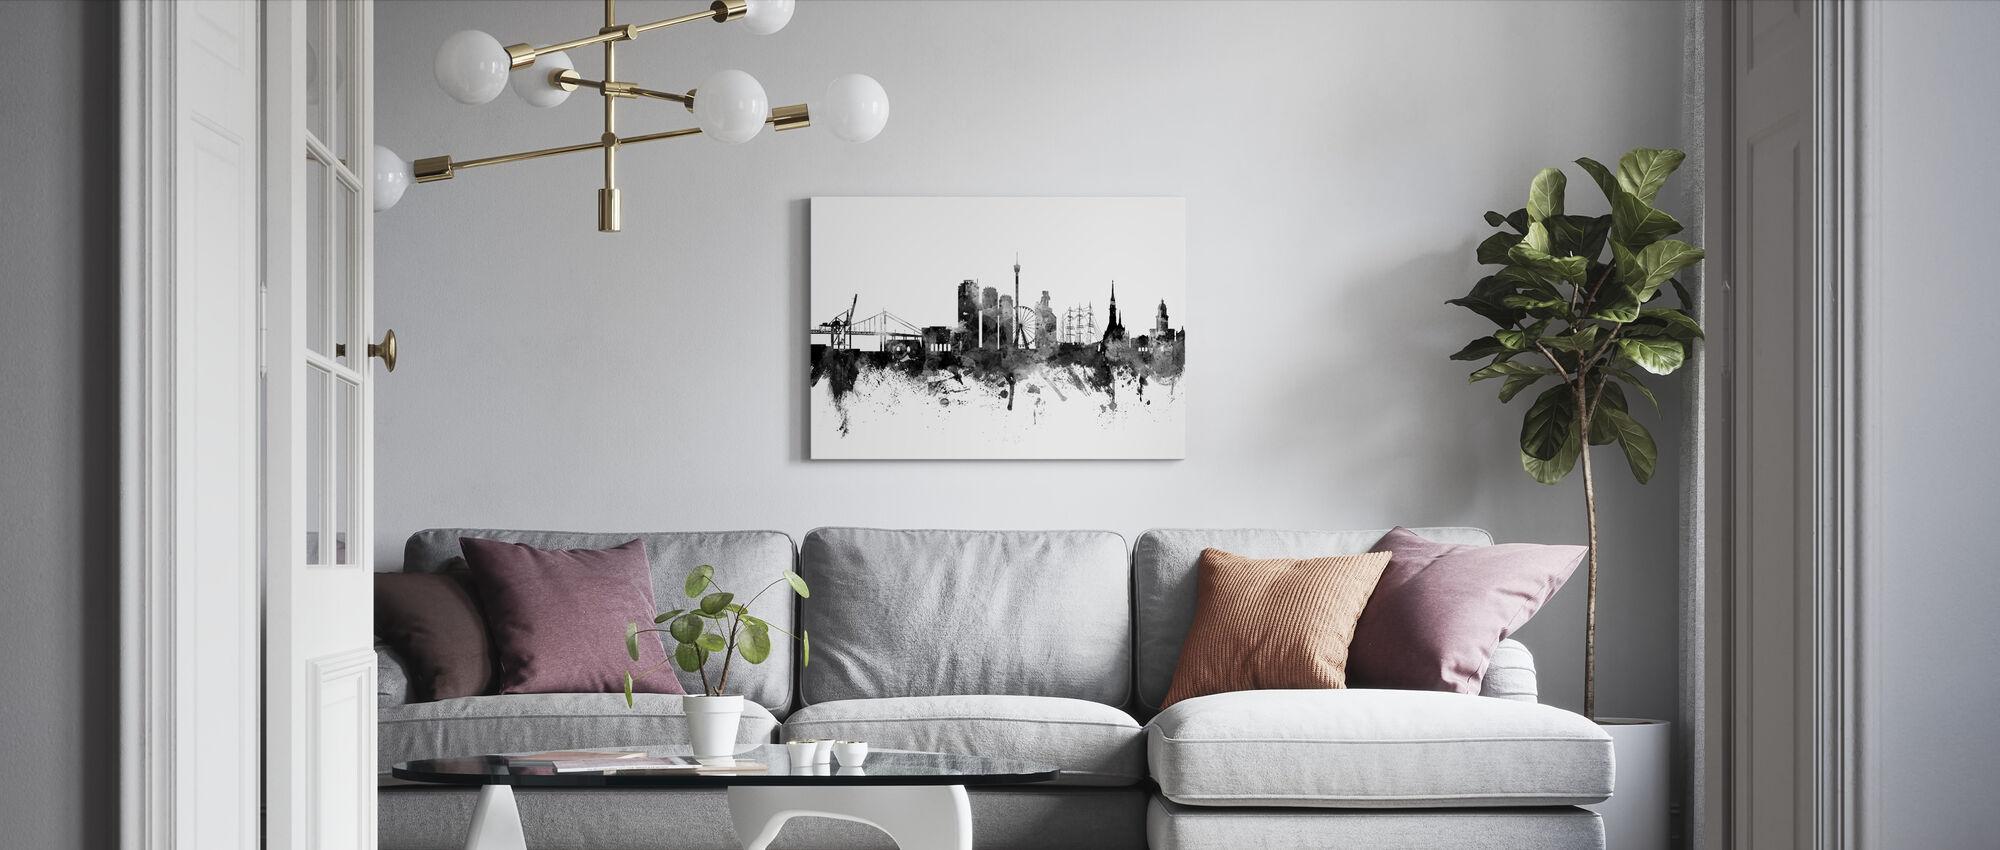 Göteborg Skyline Black - Canvastavla - Vardagsrum